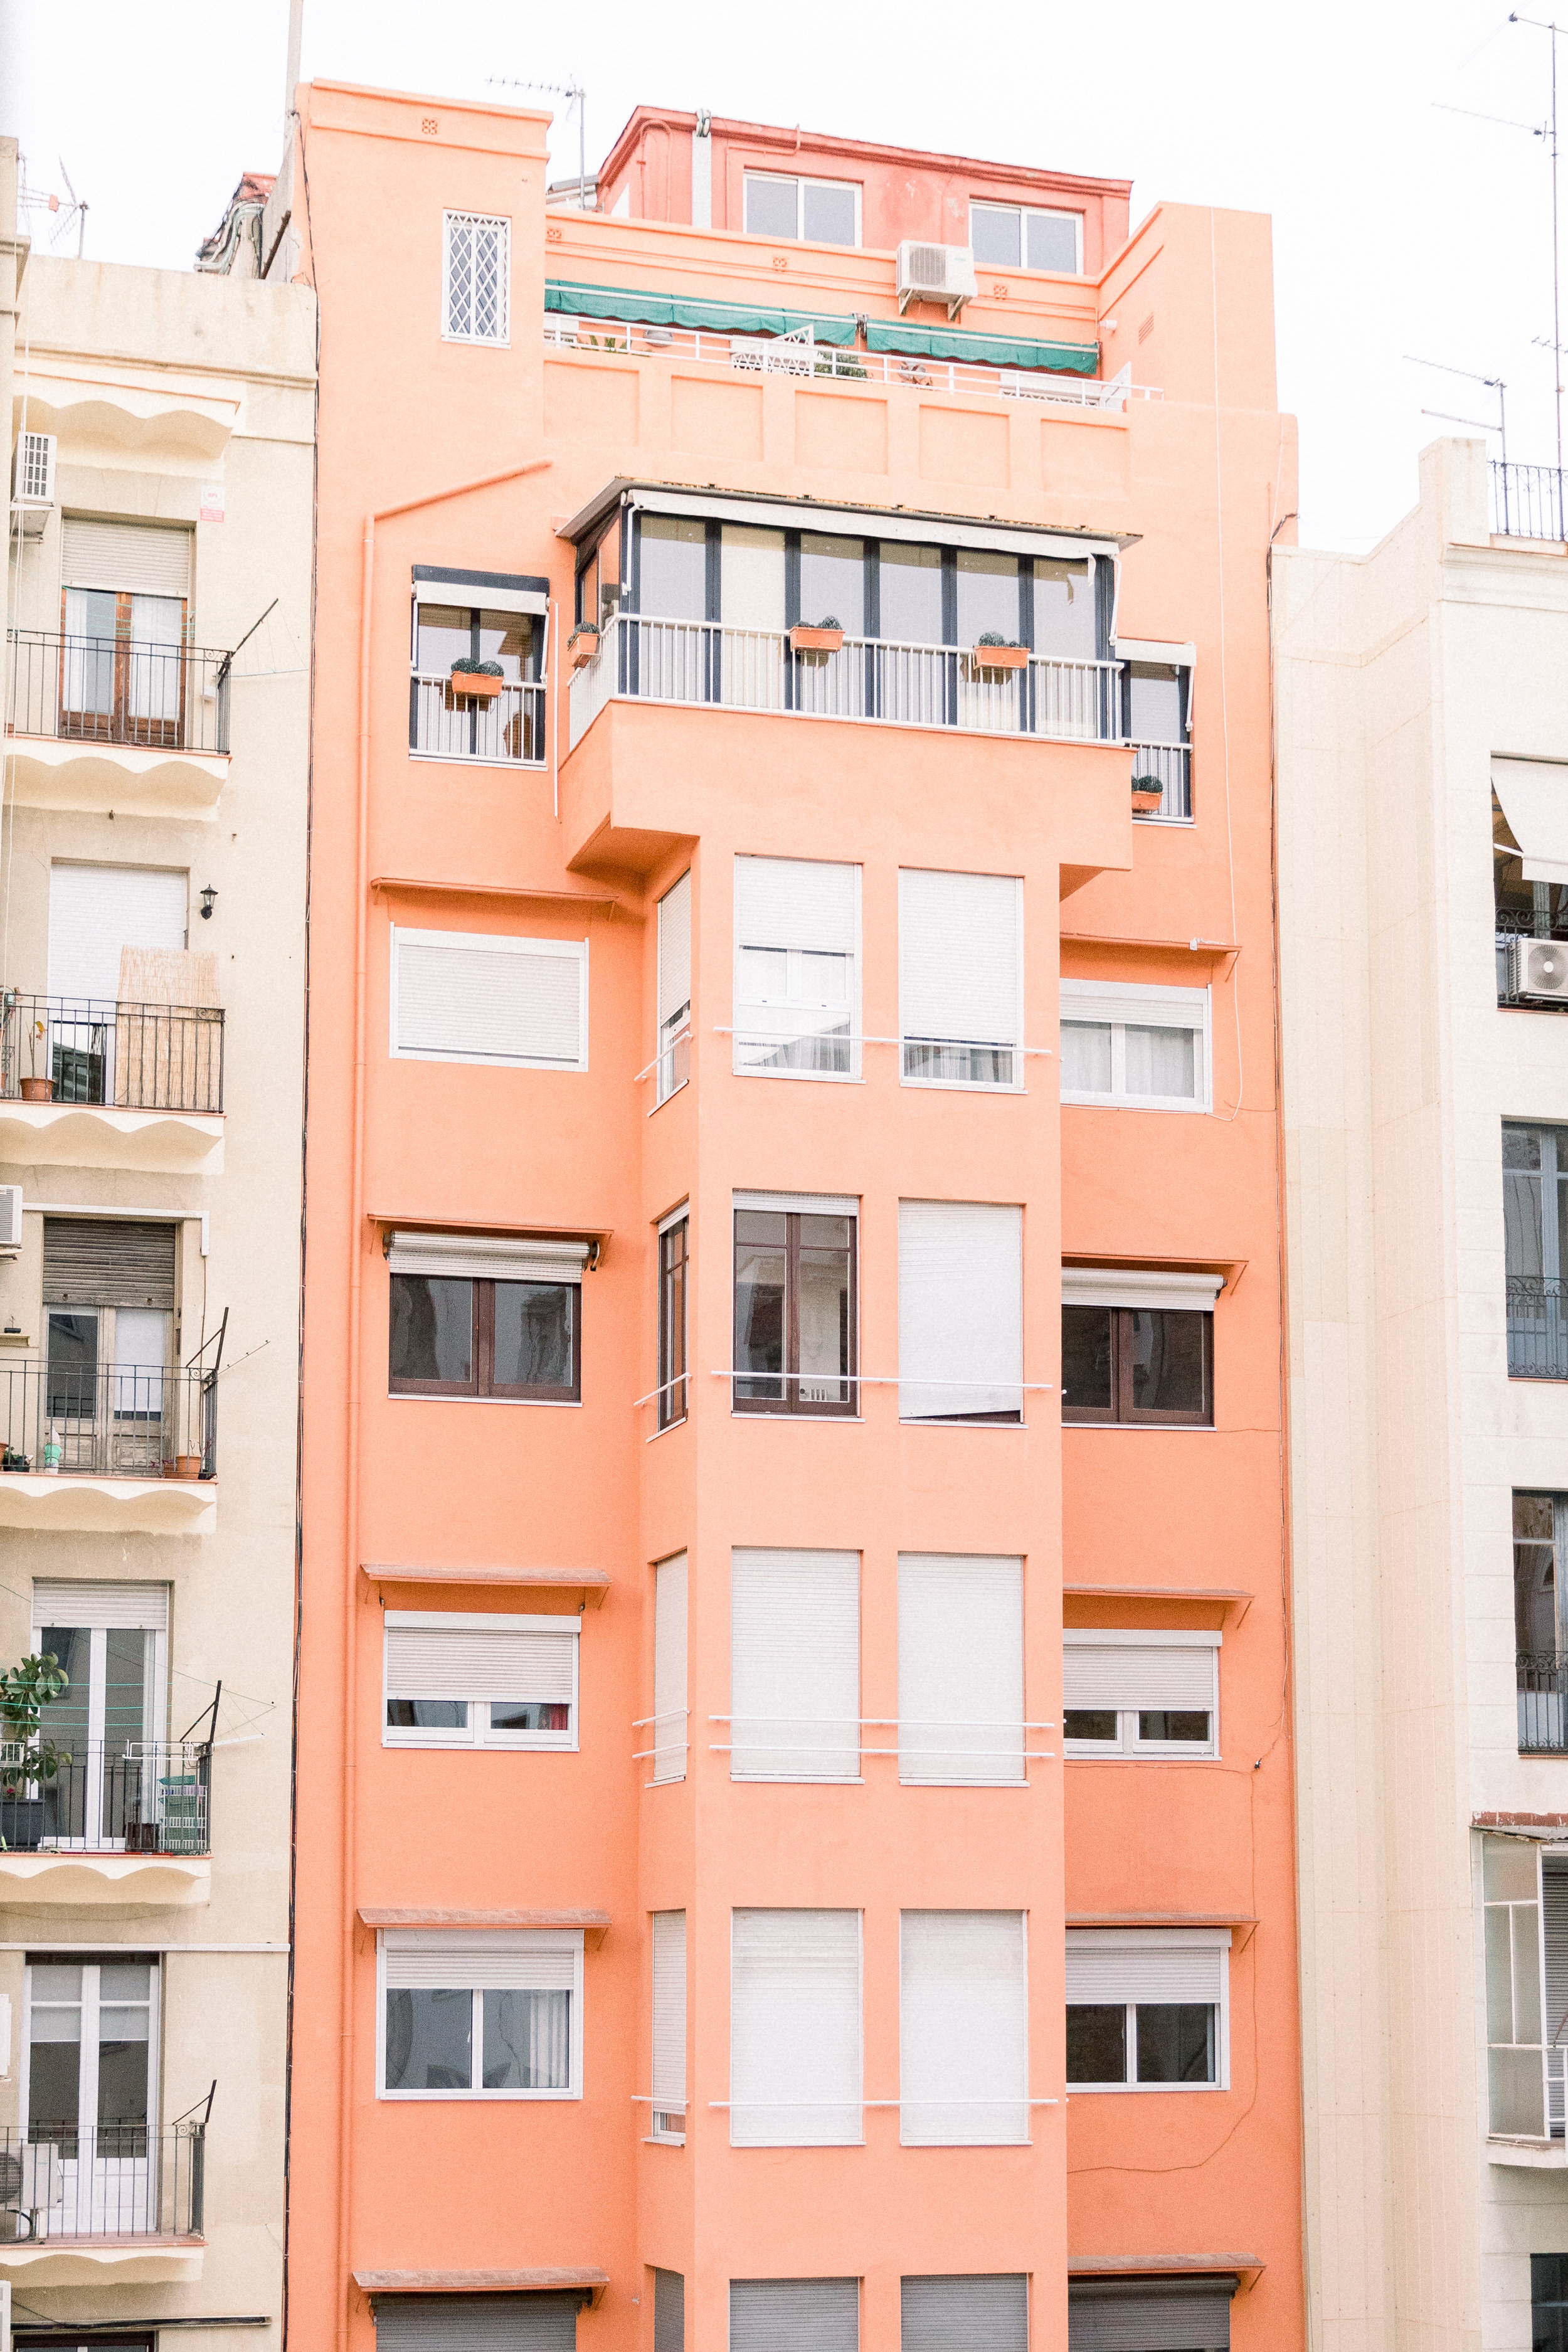 Destination-Spain-Travel-Barcelona-Apartment-Building-Photographer-3.jpg